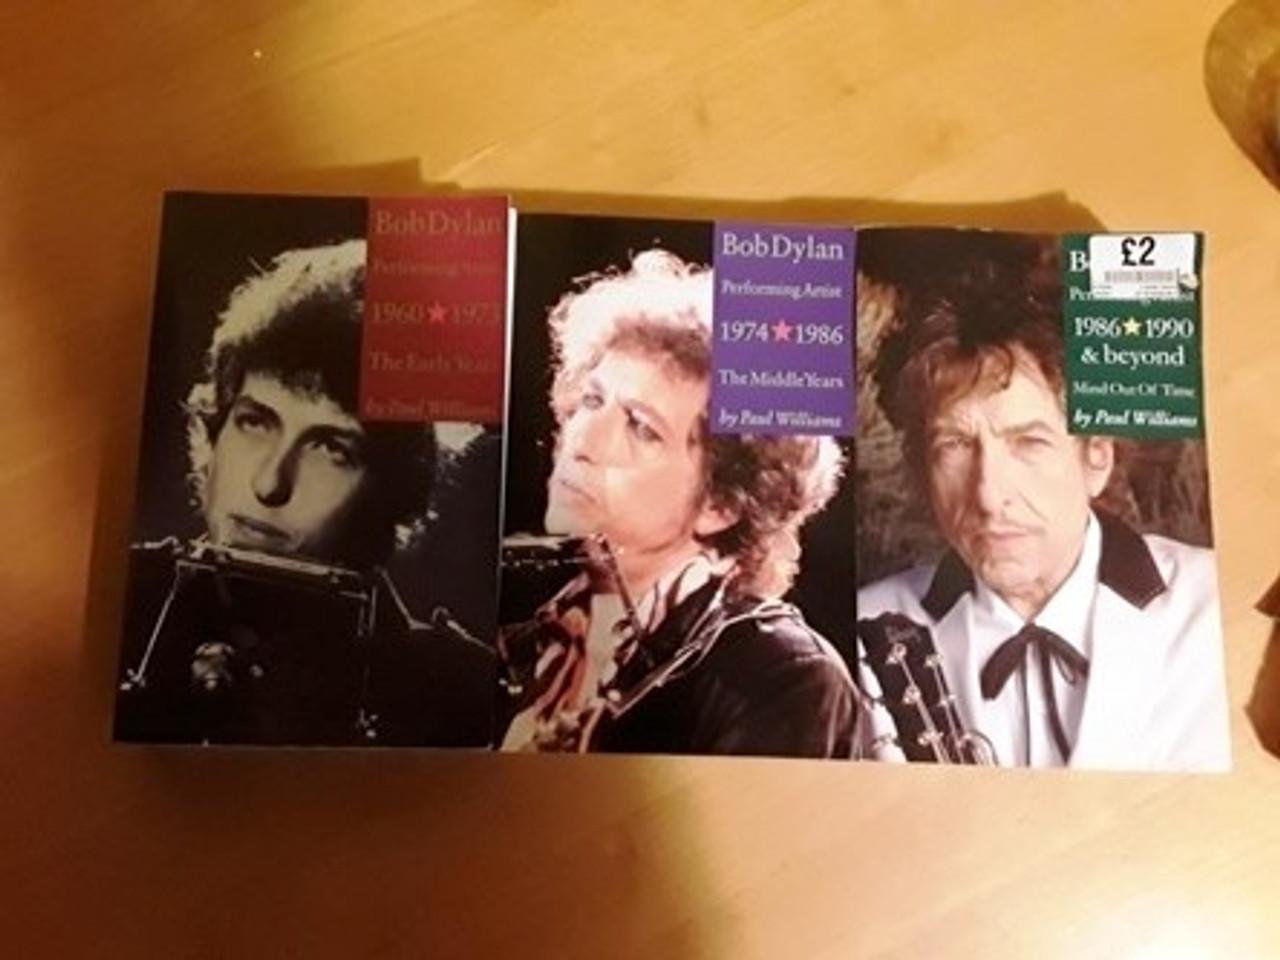 Bob Dylan Performing Artist (3 Box Set)